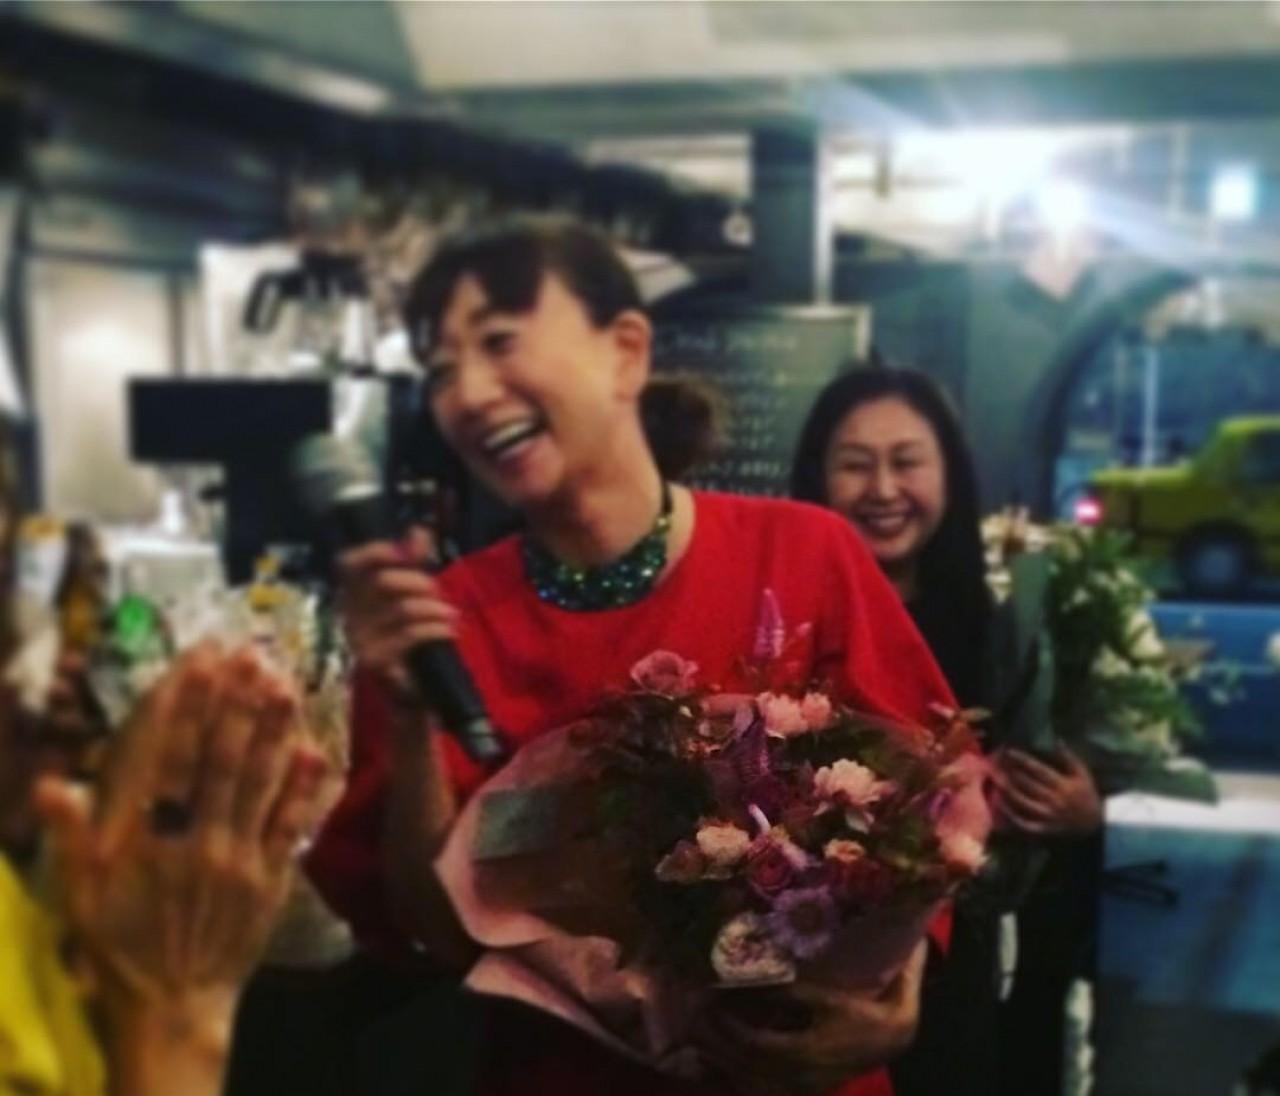 『 LIFE IS BEAUTY 』藤原美智子さんの出版記念パーティーへ!